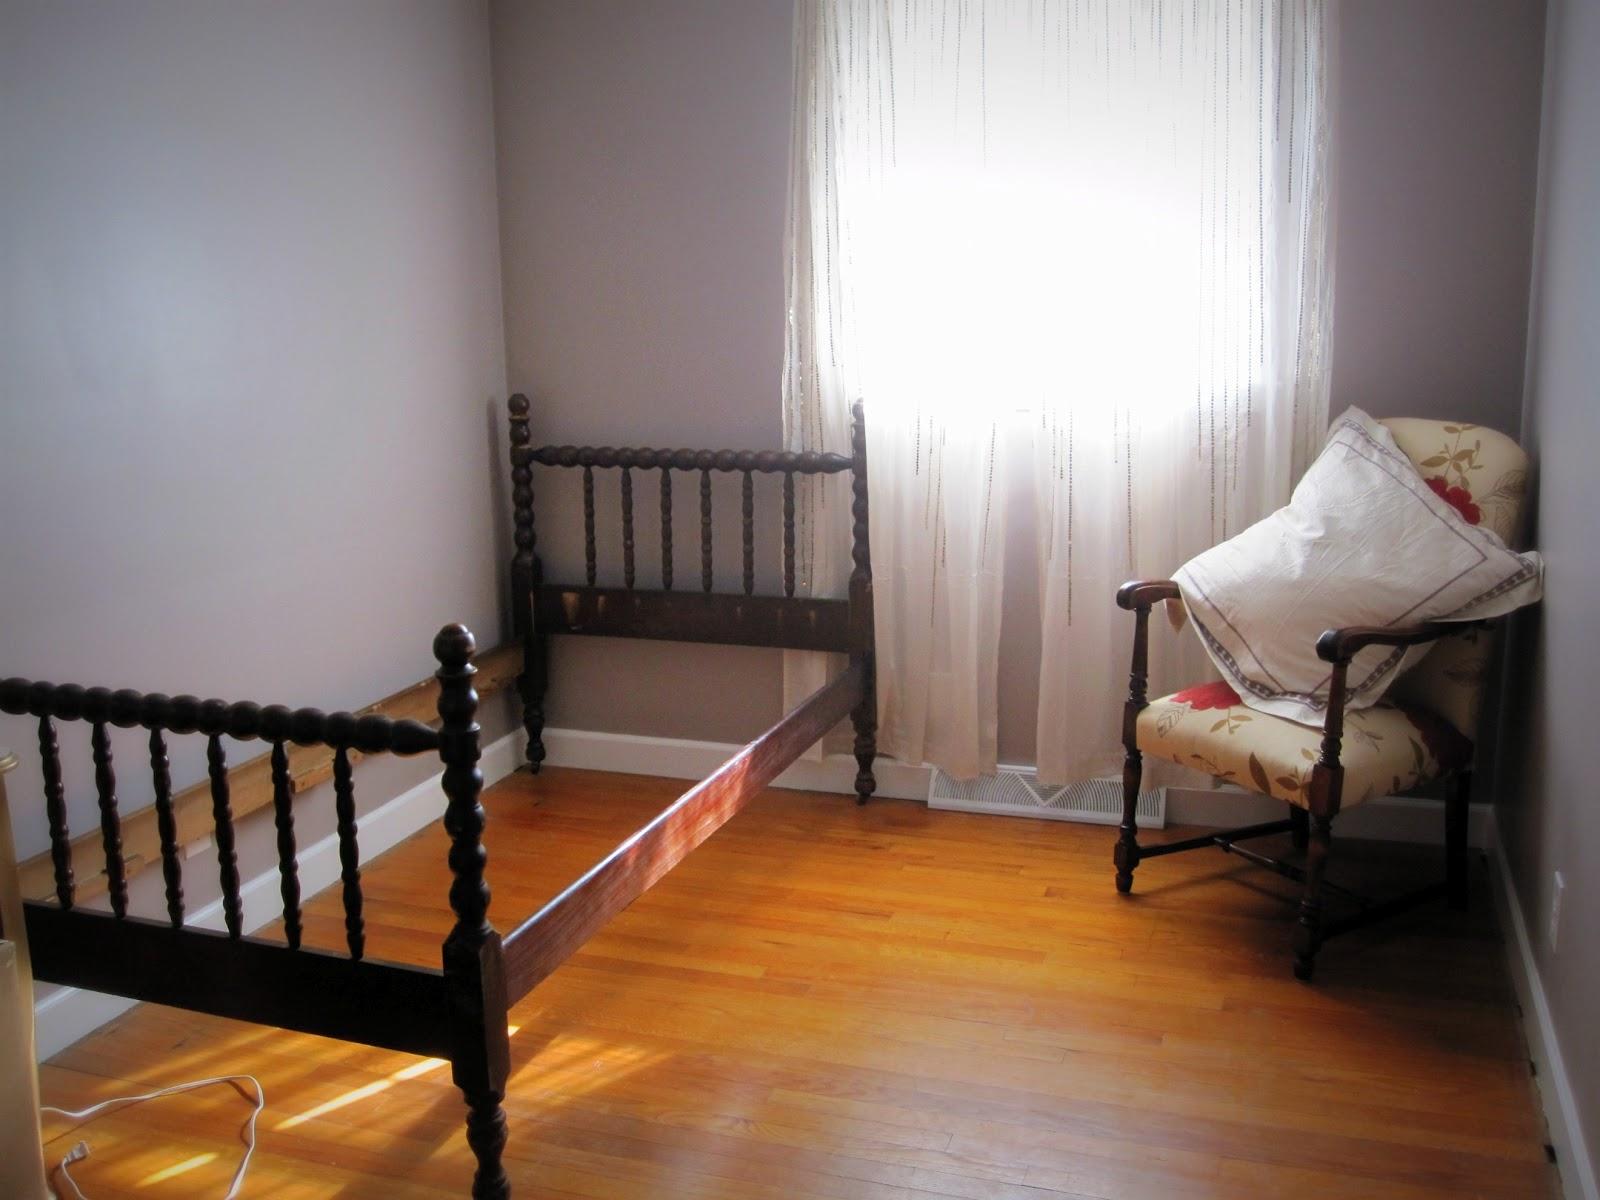 pic dealer wilsonville or area or craigslist sofa beds